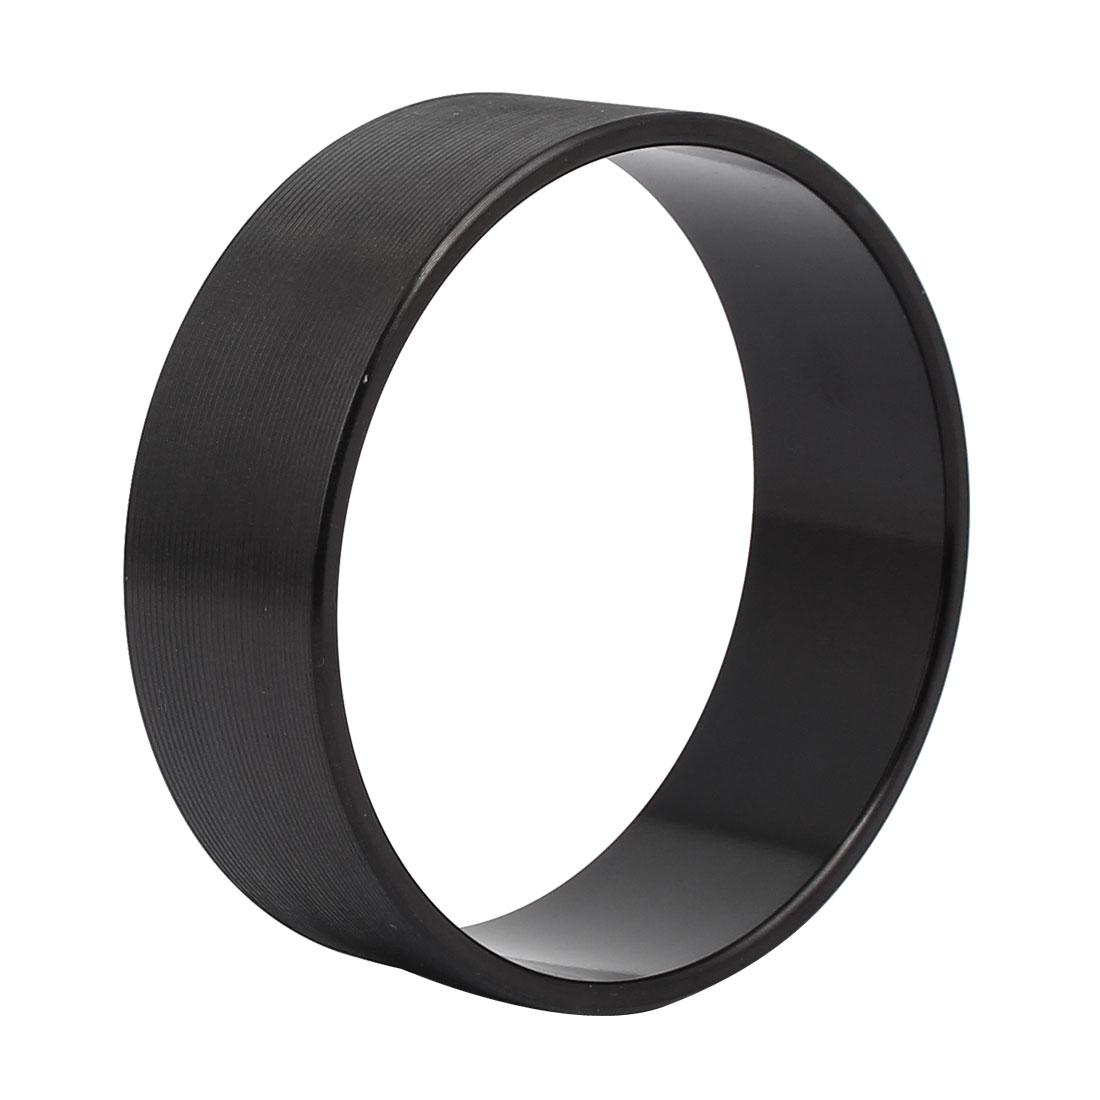 69mmx63.7mmx23.1mm Metal Cylinder Sleeve Black for Air Compressor